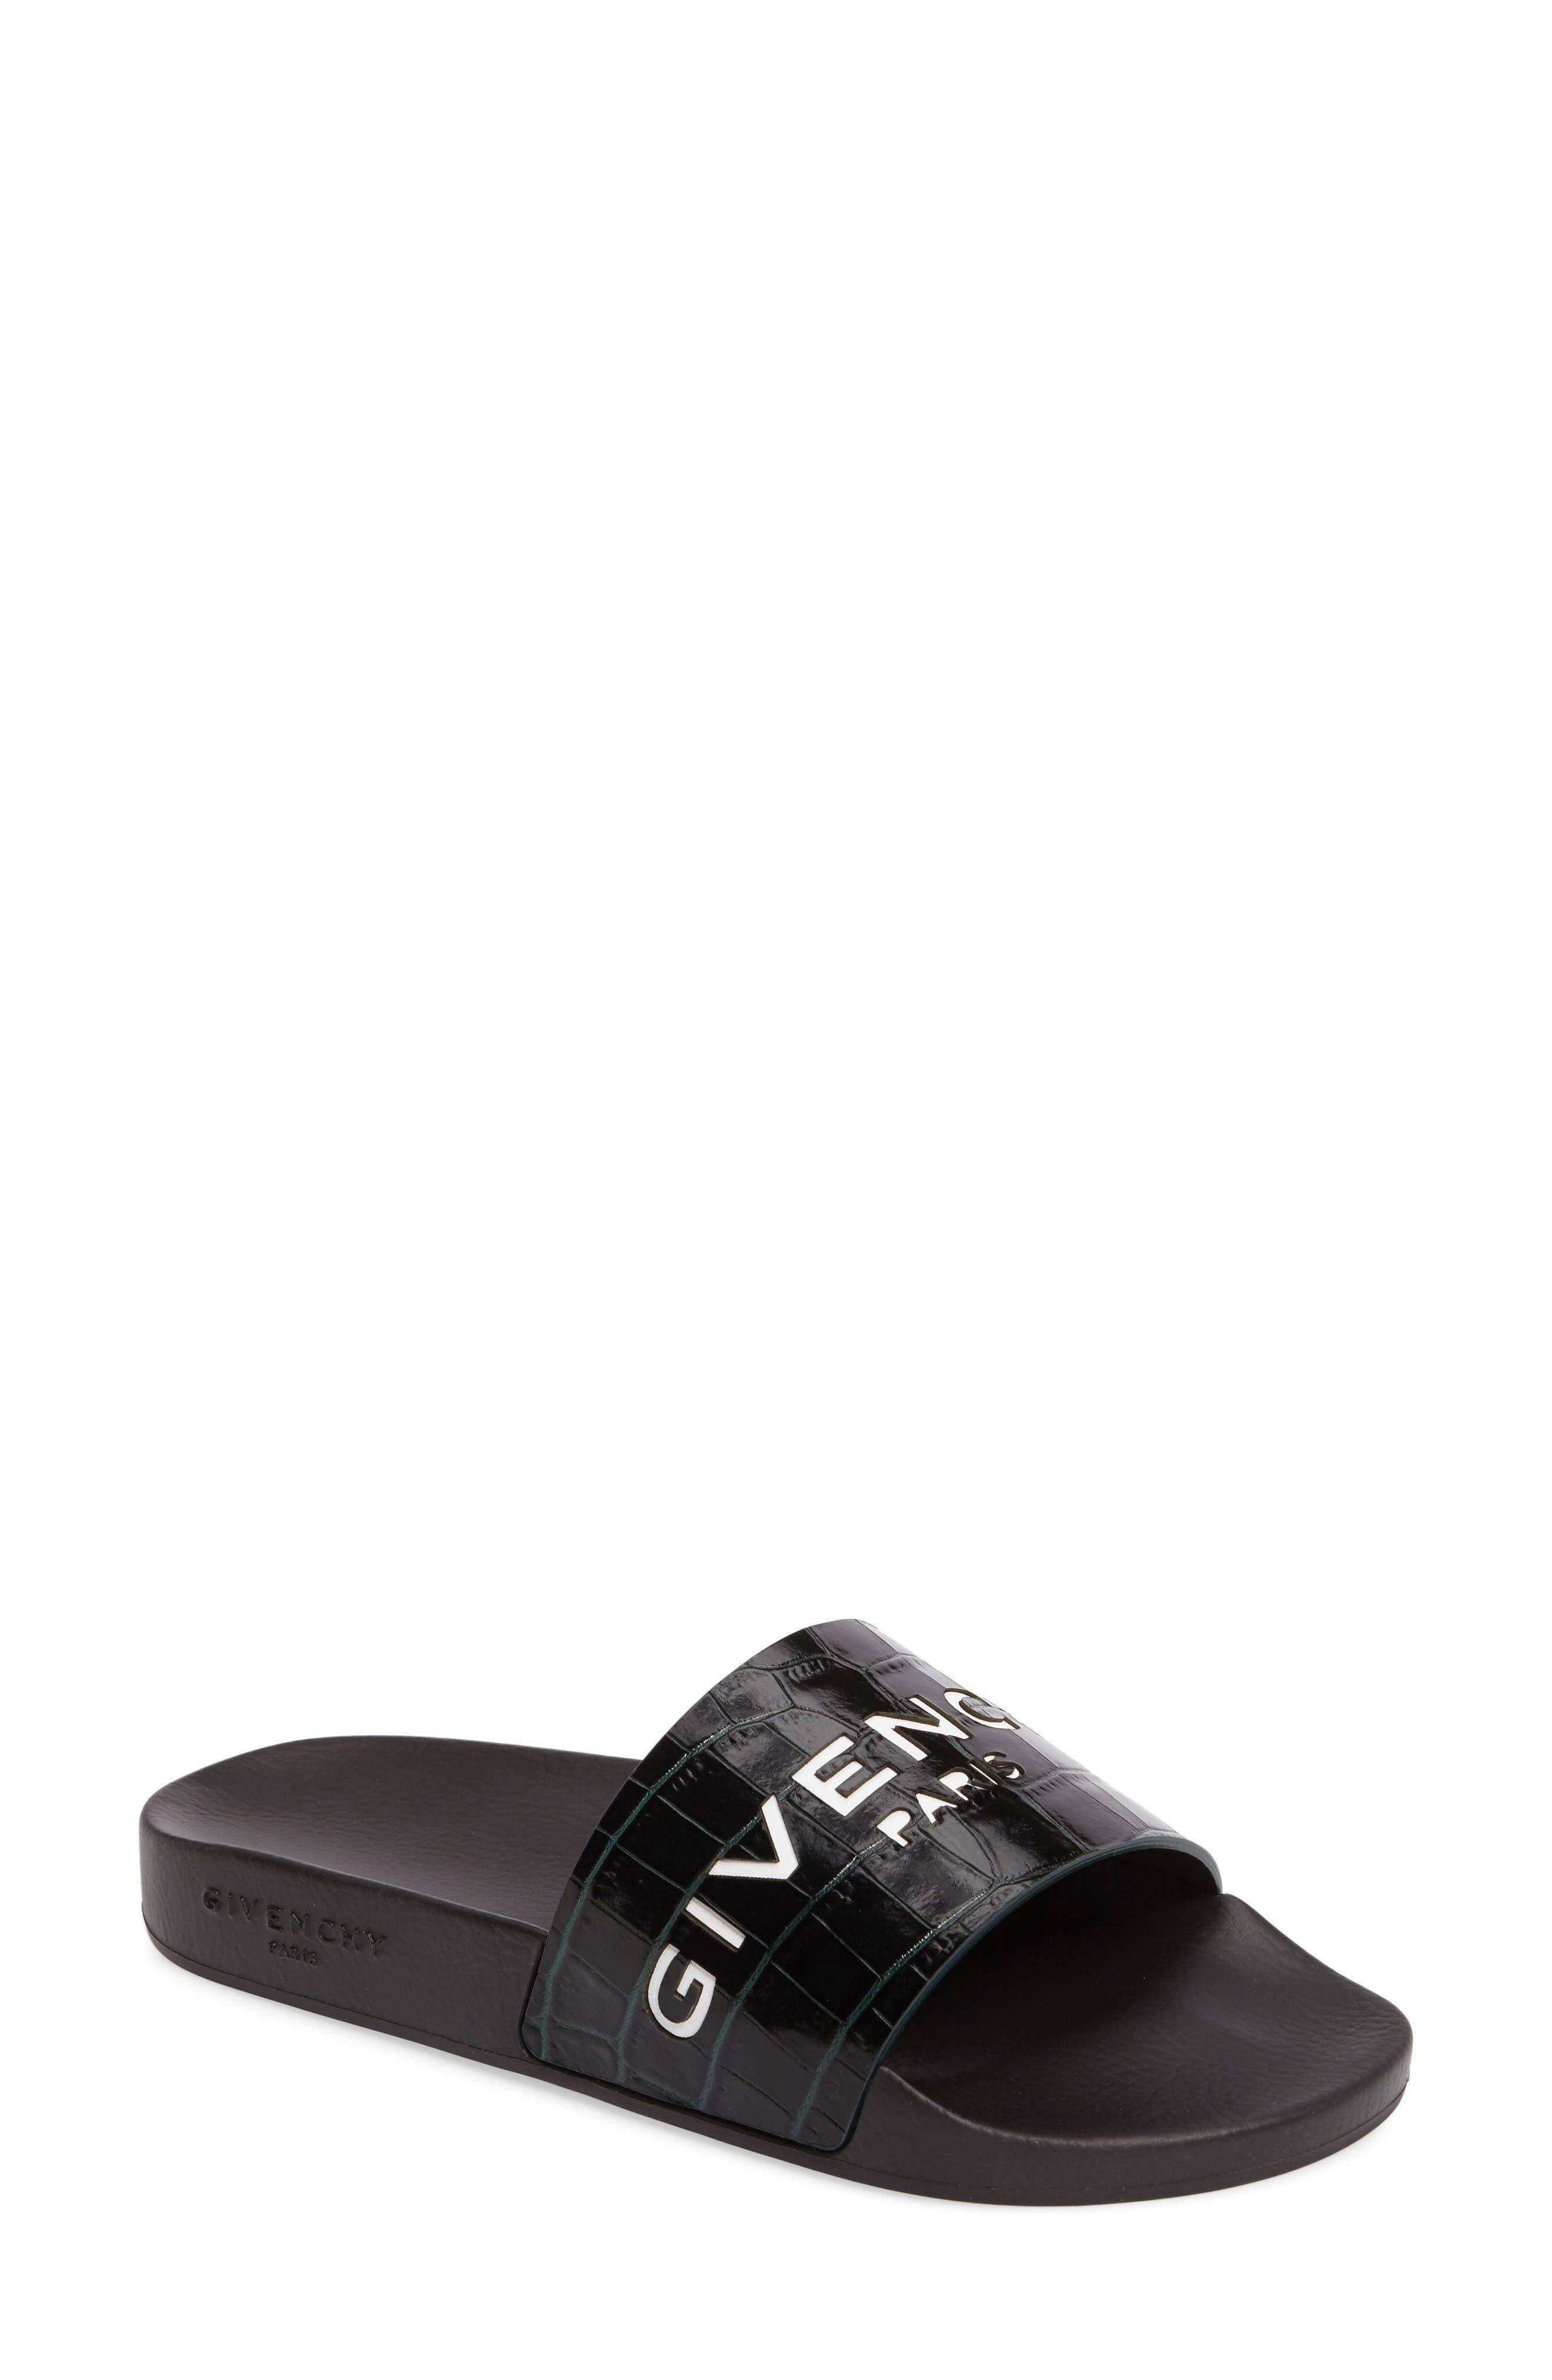 Main Image - Givenchy Logo Slide Sandal (Women)